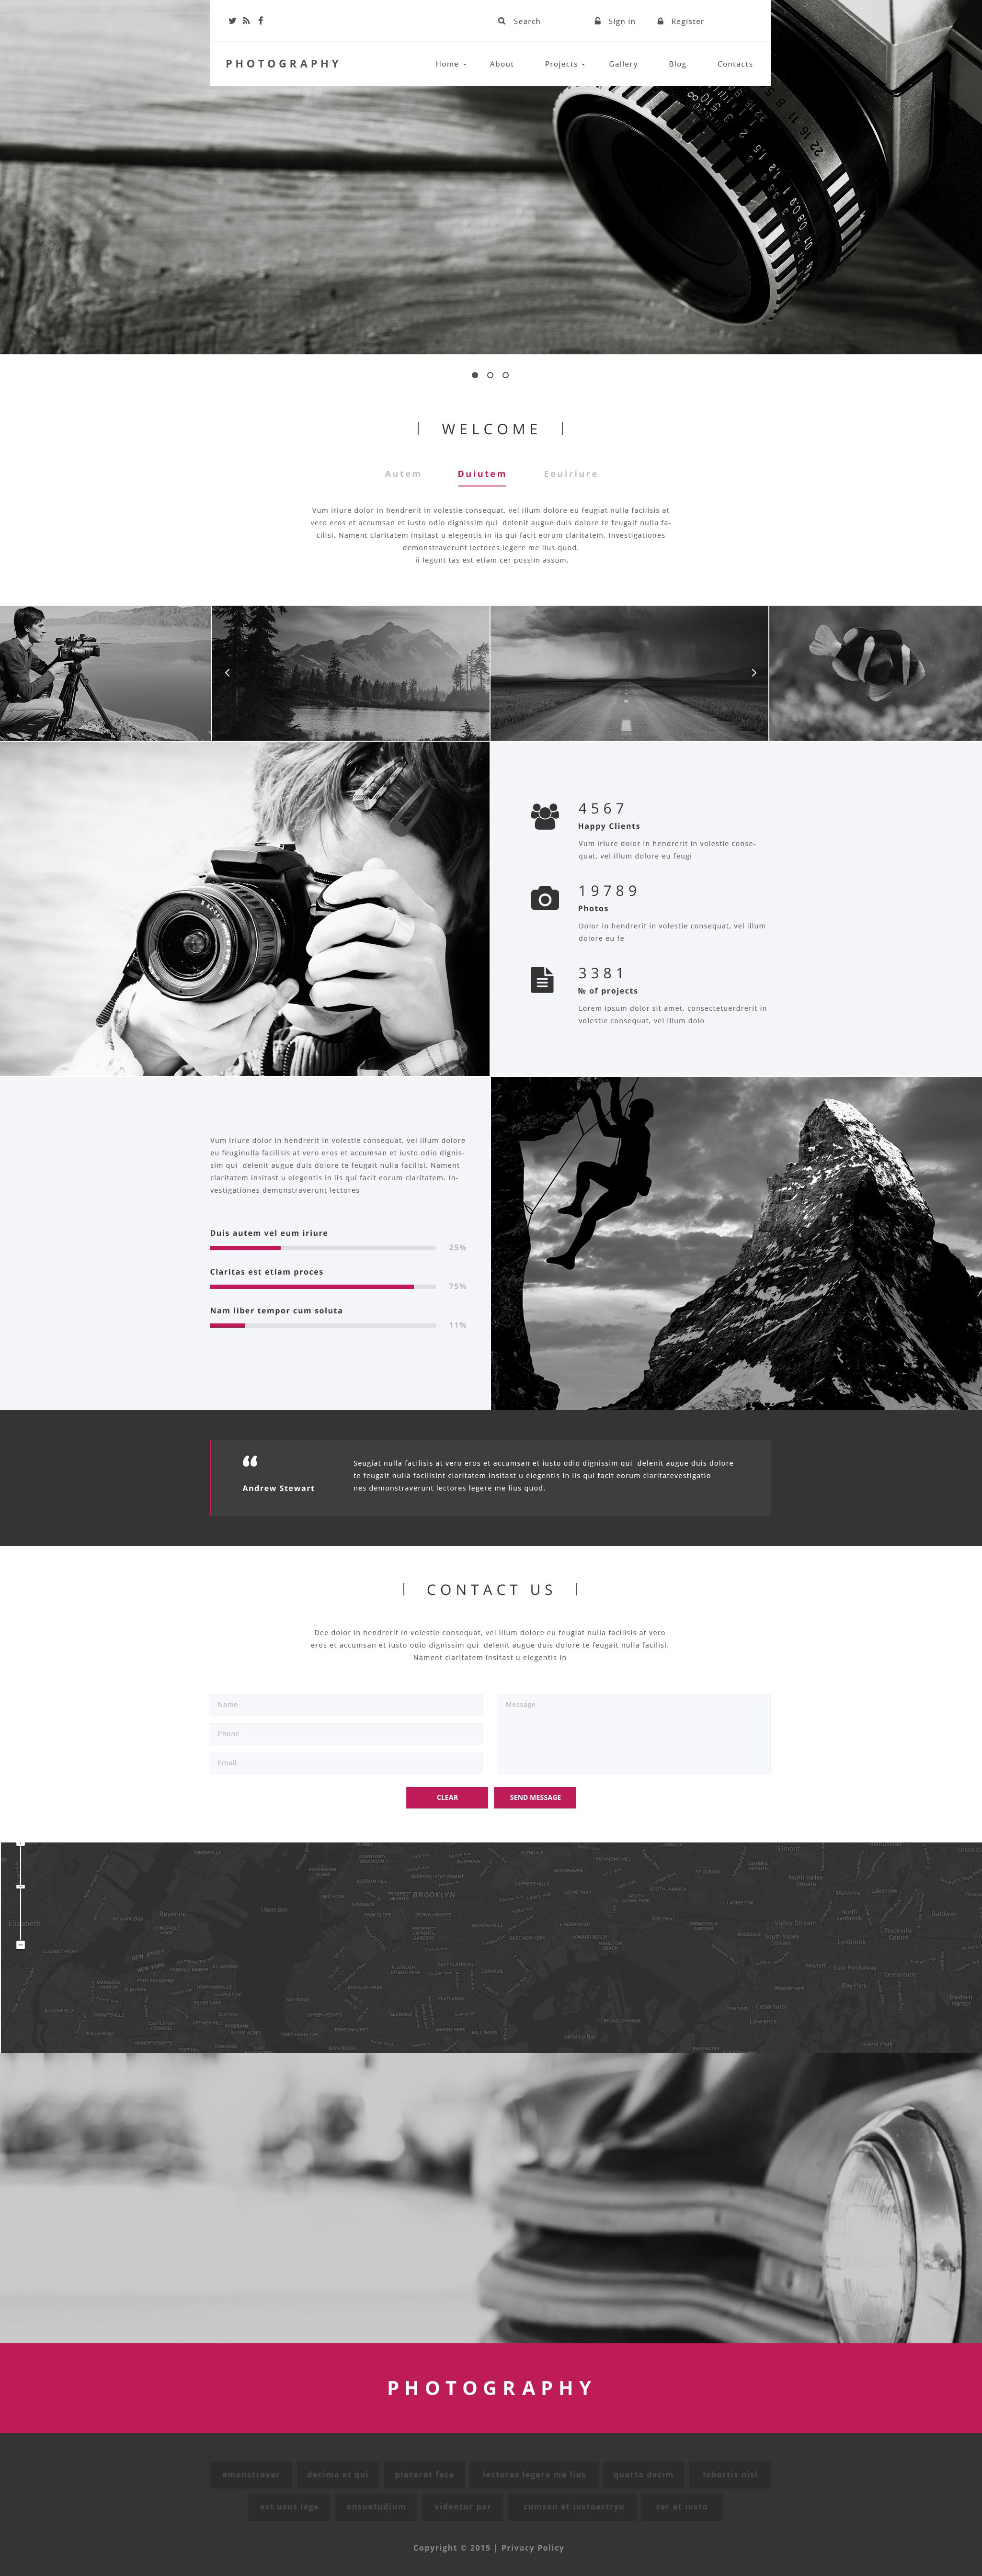 """Photography"" thème Drupal adaptatif #55089"